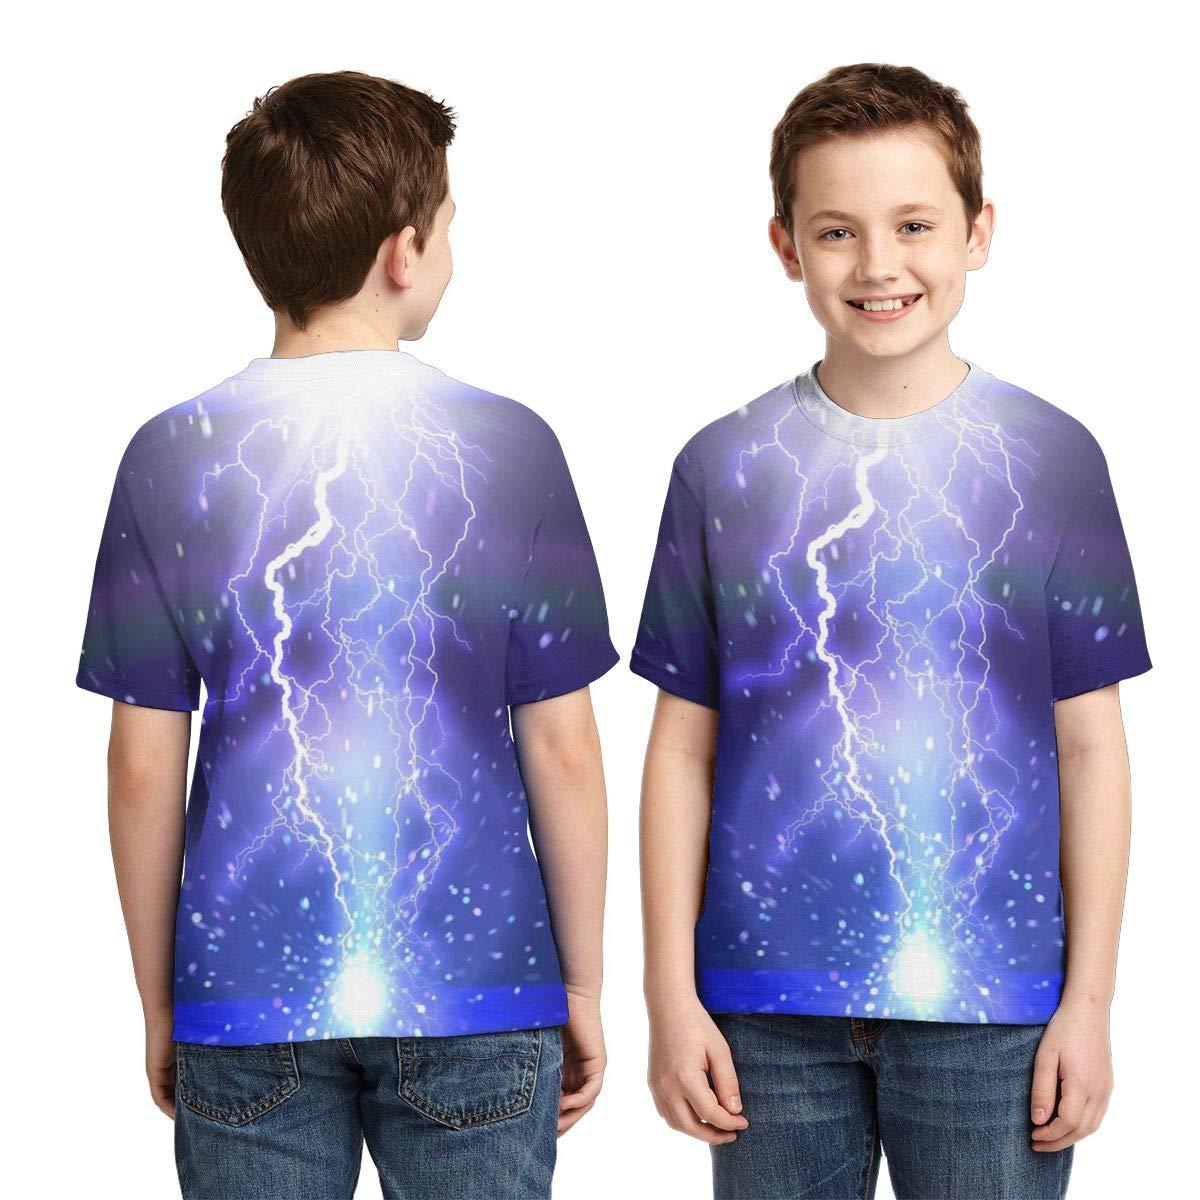 HHTZTCL Lightning Strike Kids Print Graphic Tee Short Sleeve T-Shirt